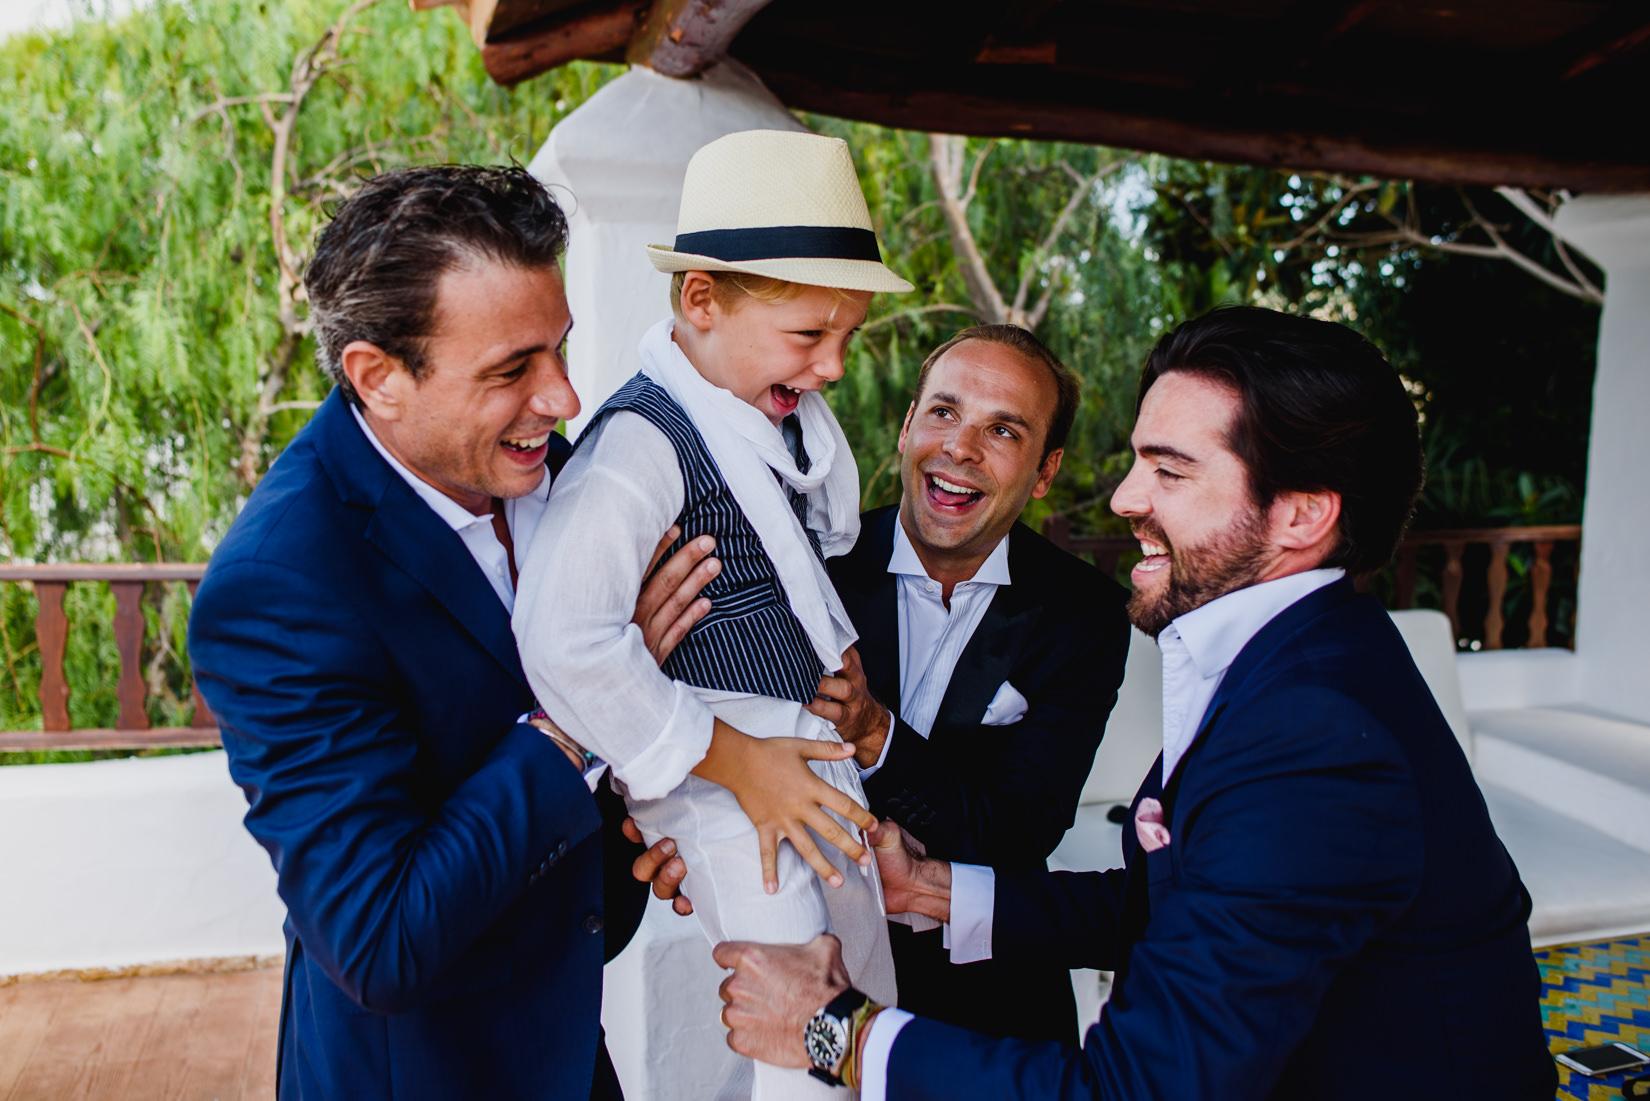 wedding-la-escollera-4.jpg